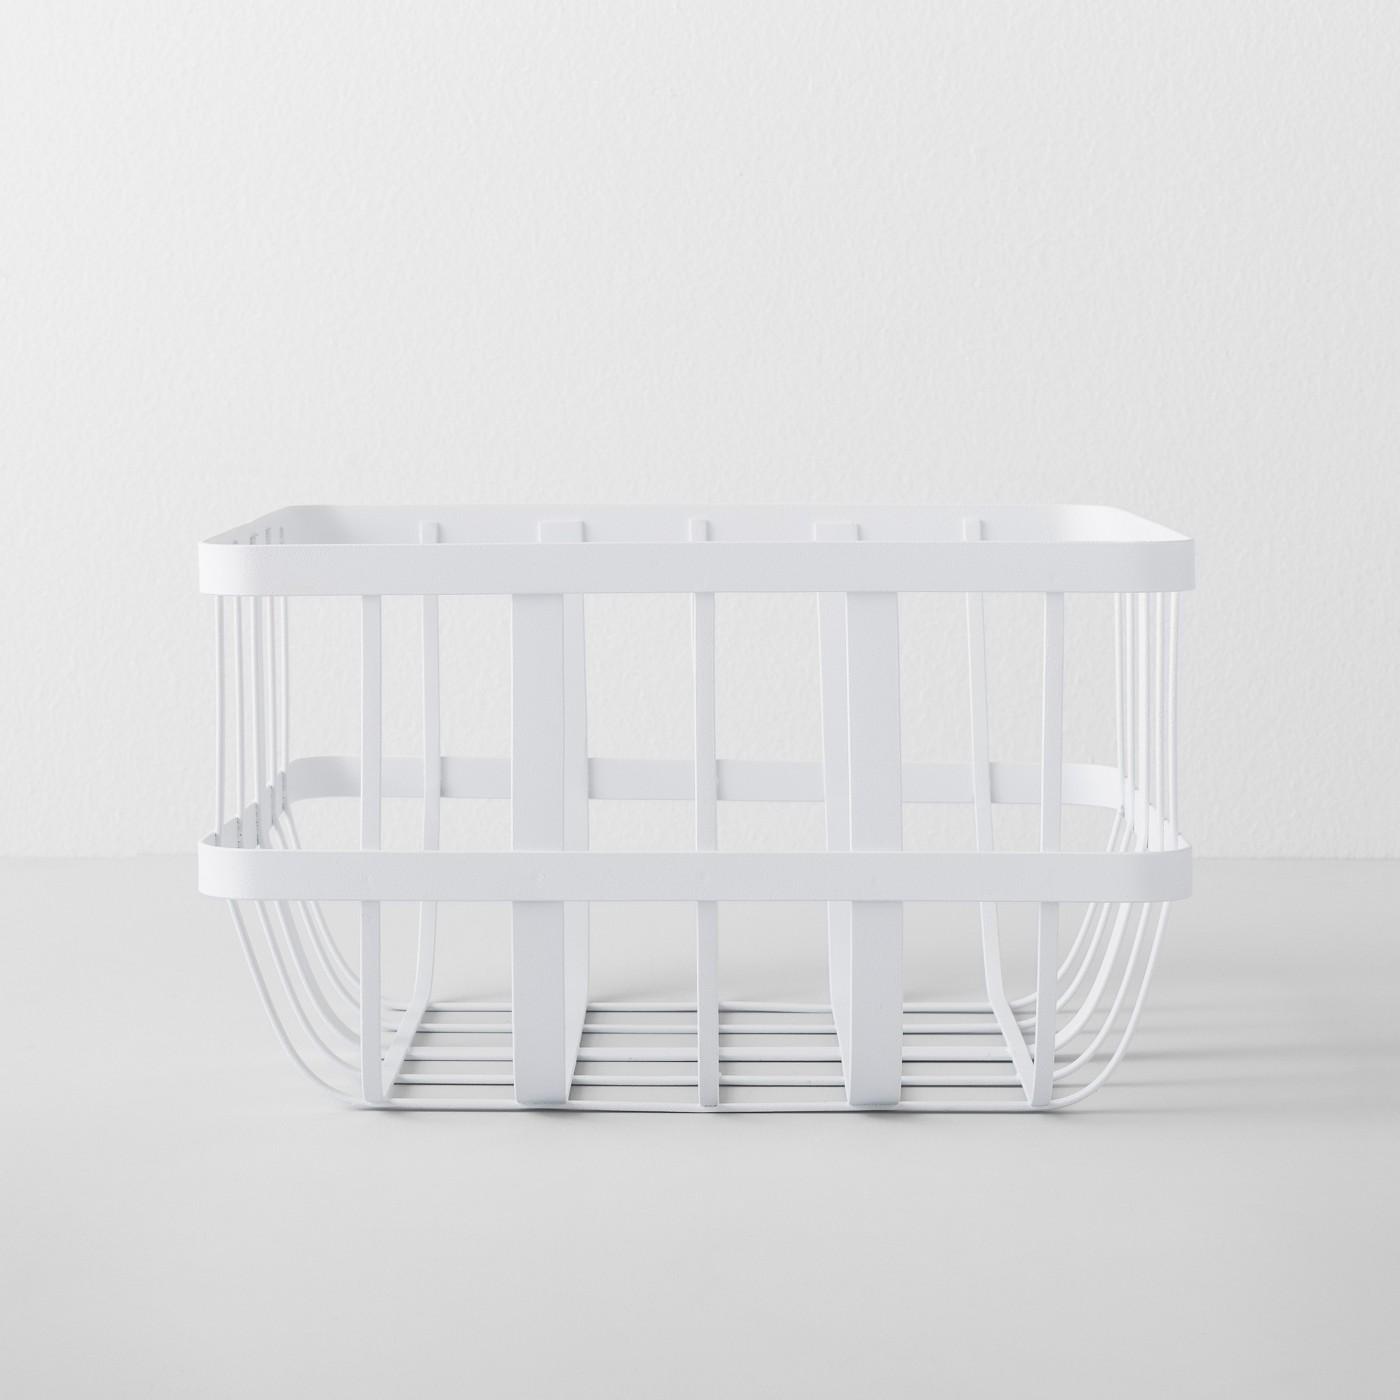 Kitchen Cabinet Organizer Basket White - Made By Design™ - image 1 of 4